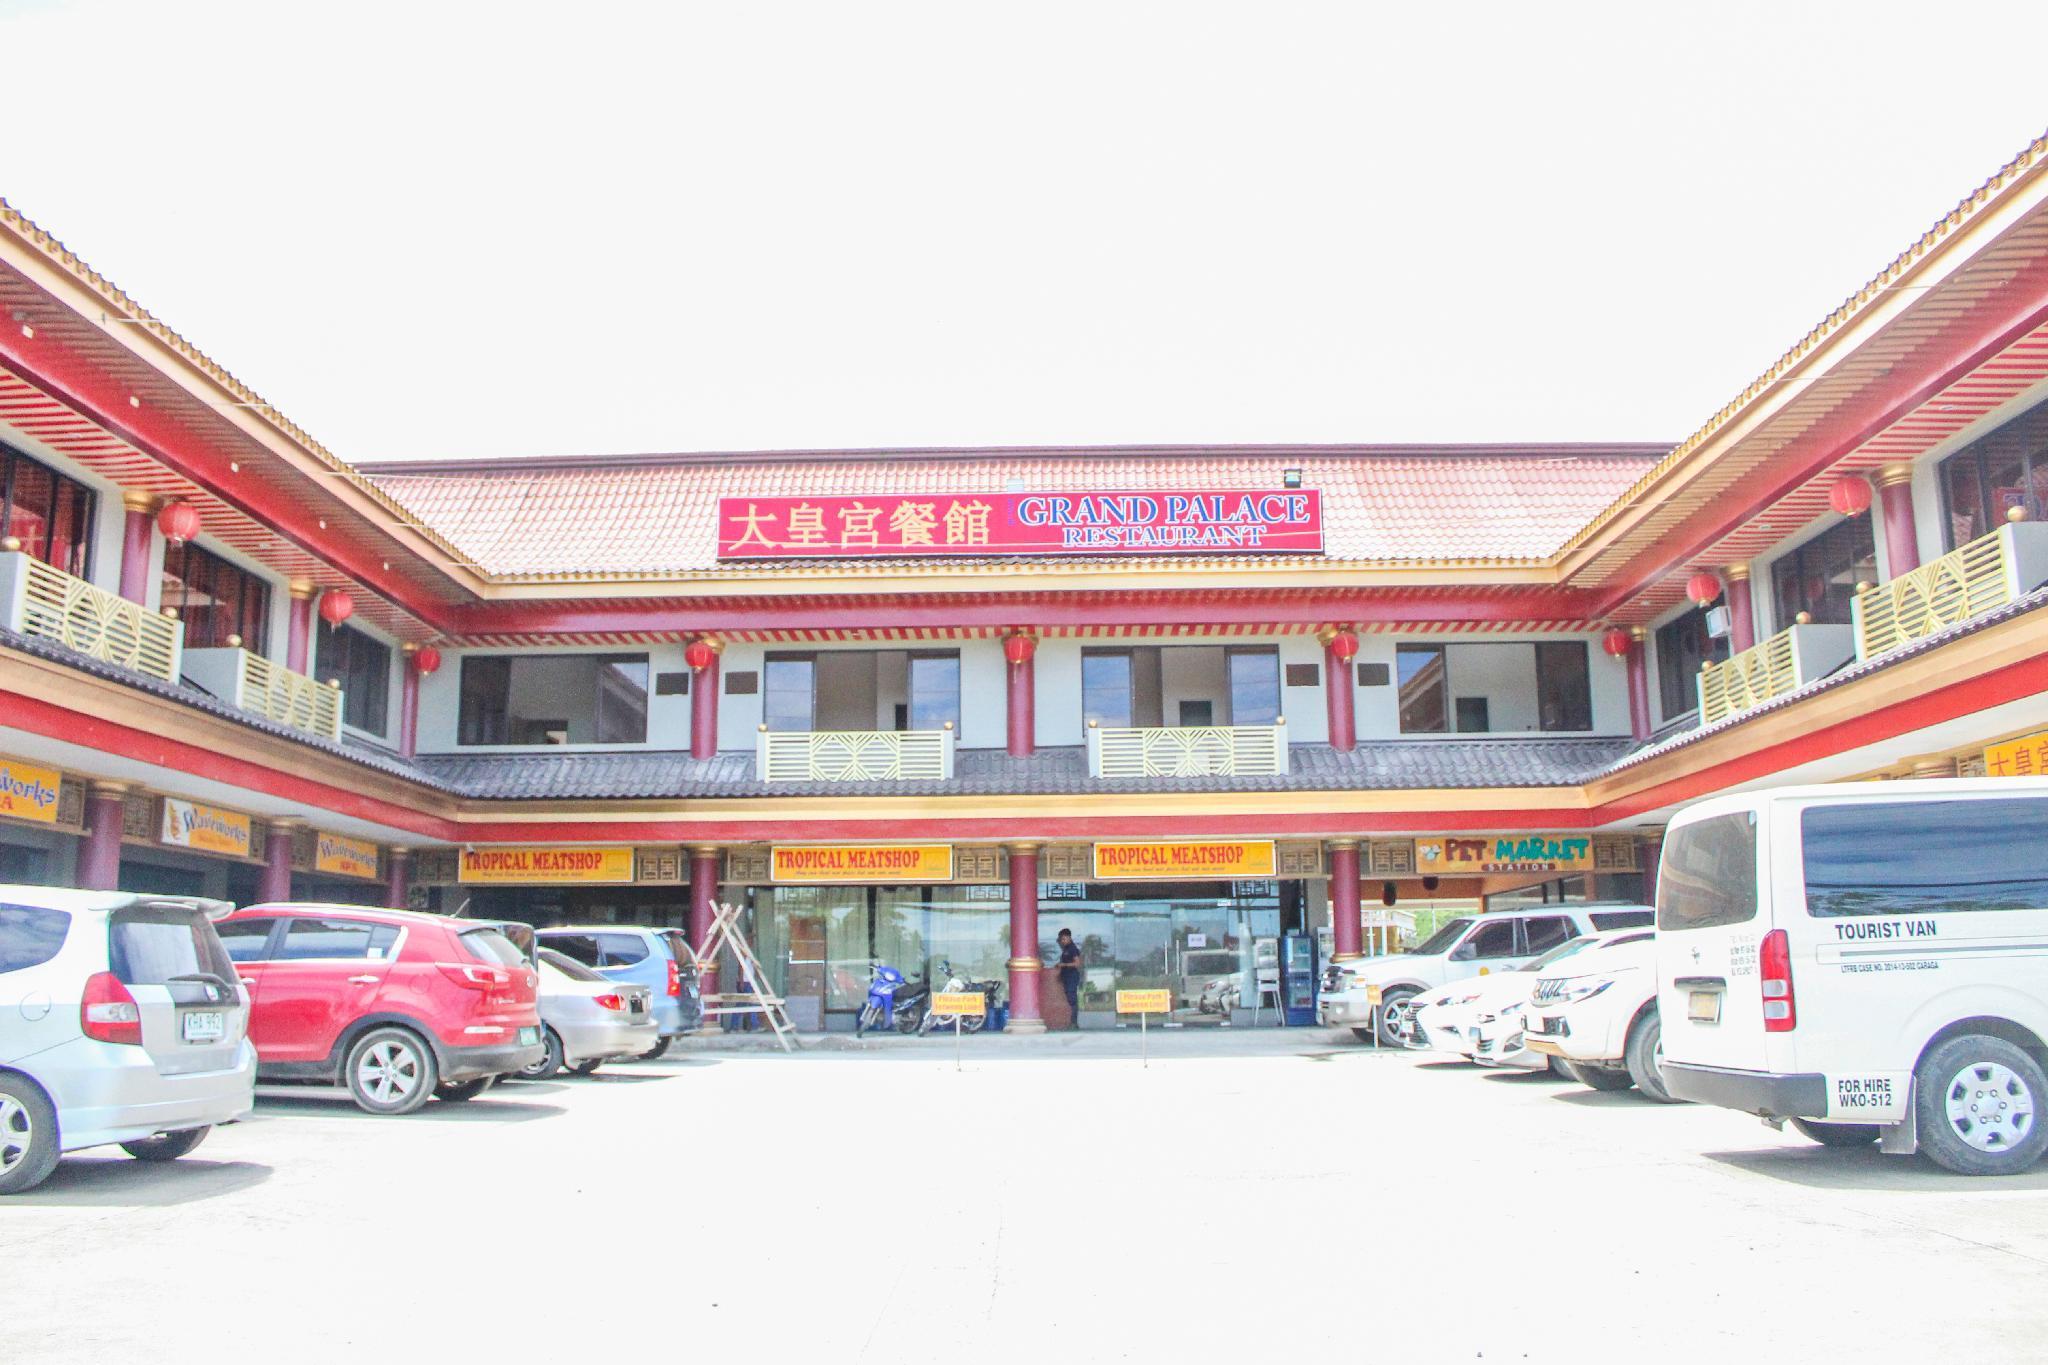 Butuan Grand Palace Annex